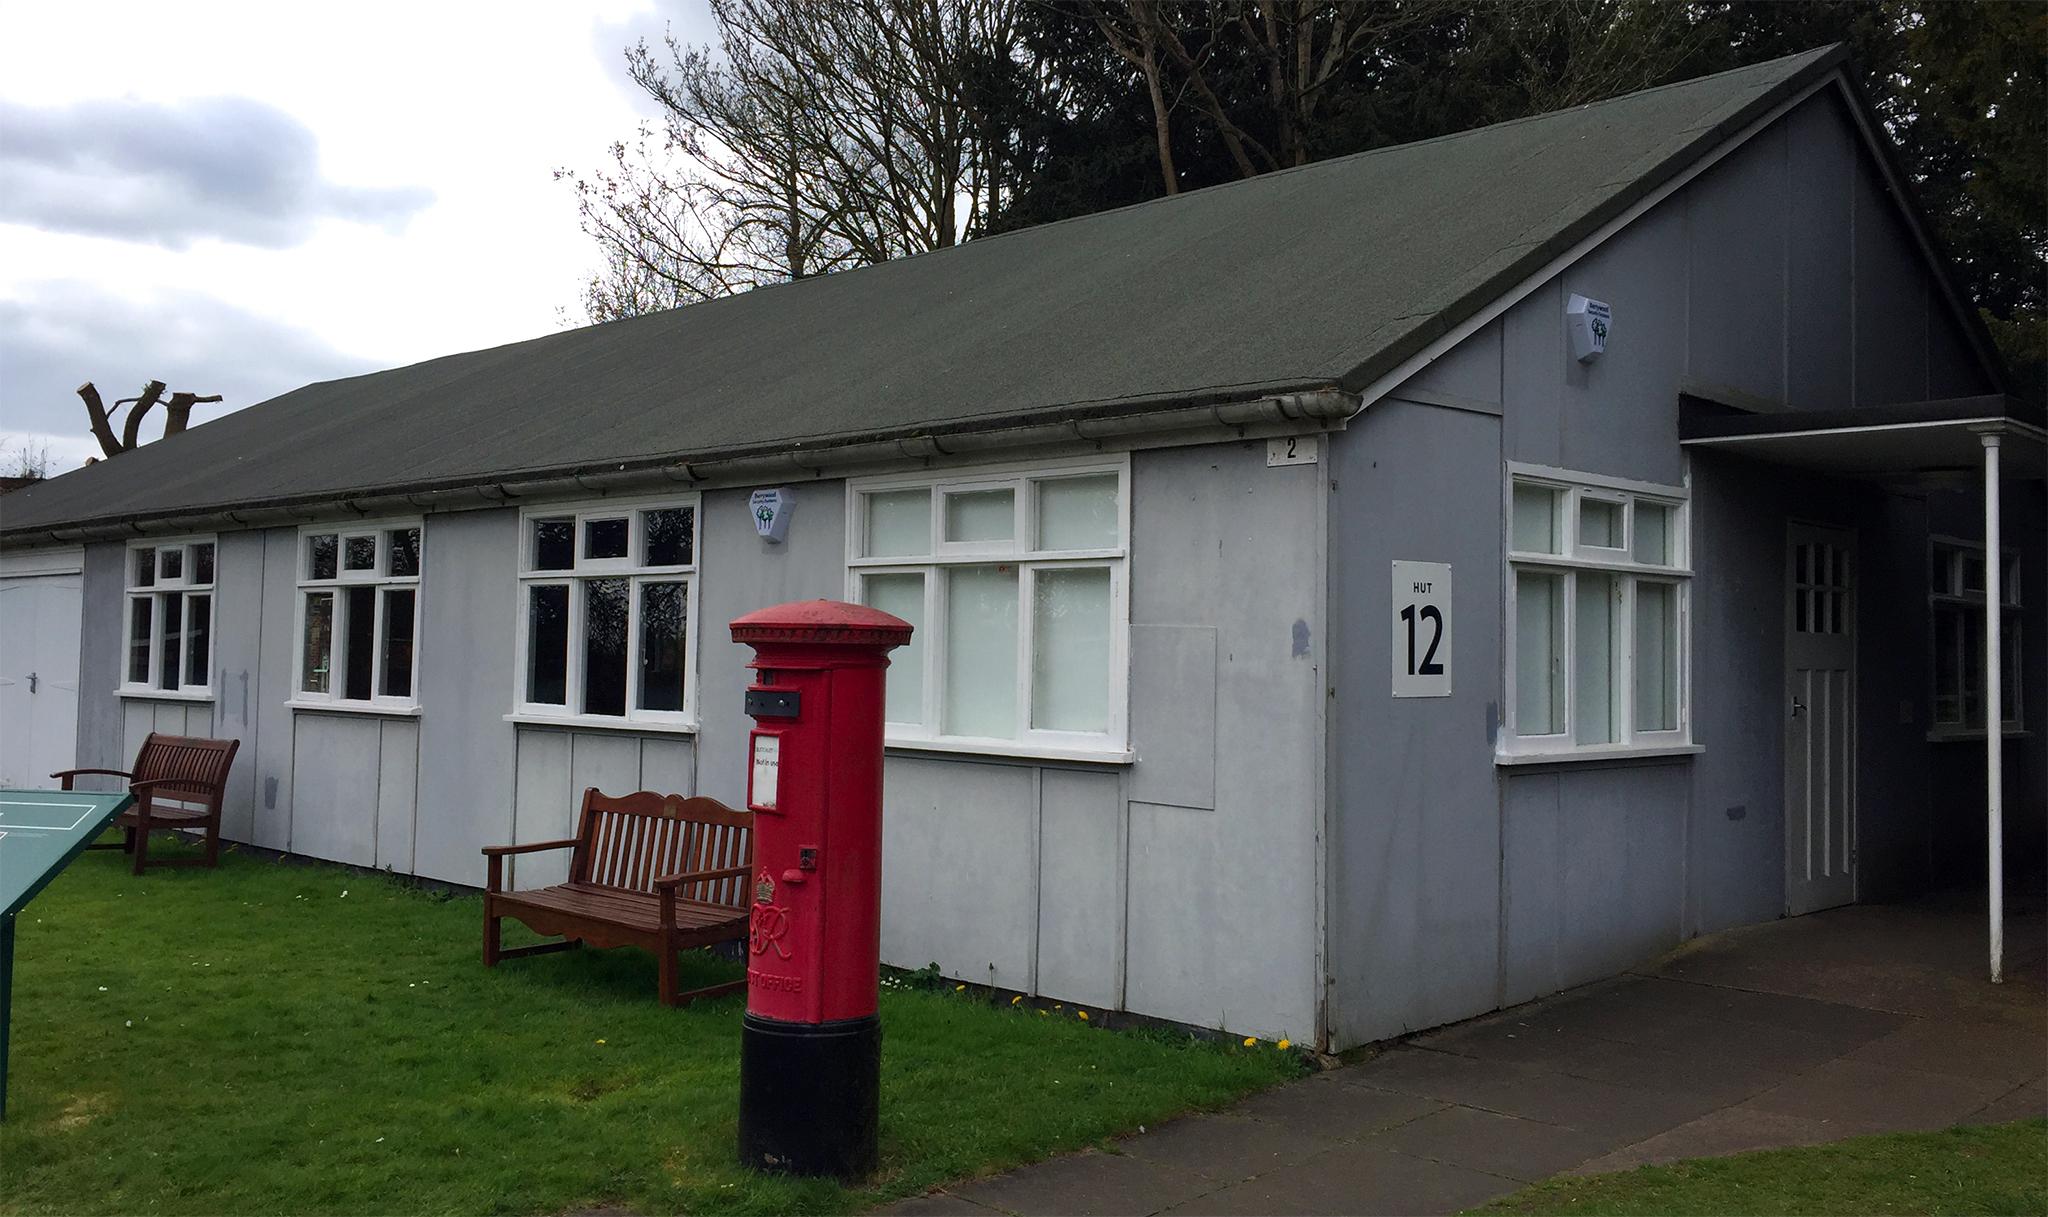 Bletchey Park, Inglaterra bletchley park - 38099171084 e6a038f401 o - Bletchley Park, el secreto mejor guardado de Inglaterra